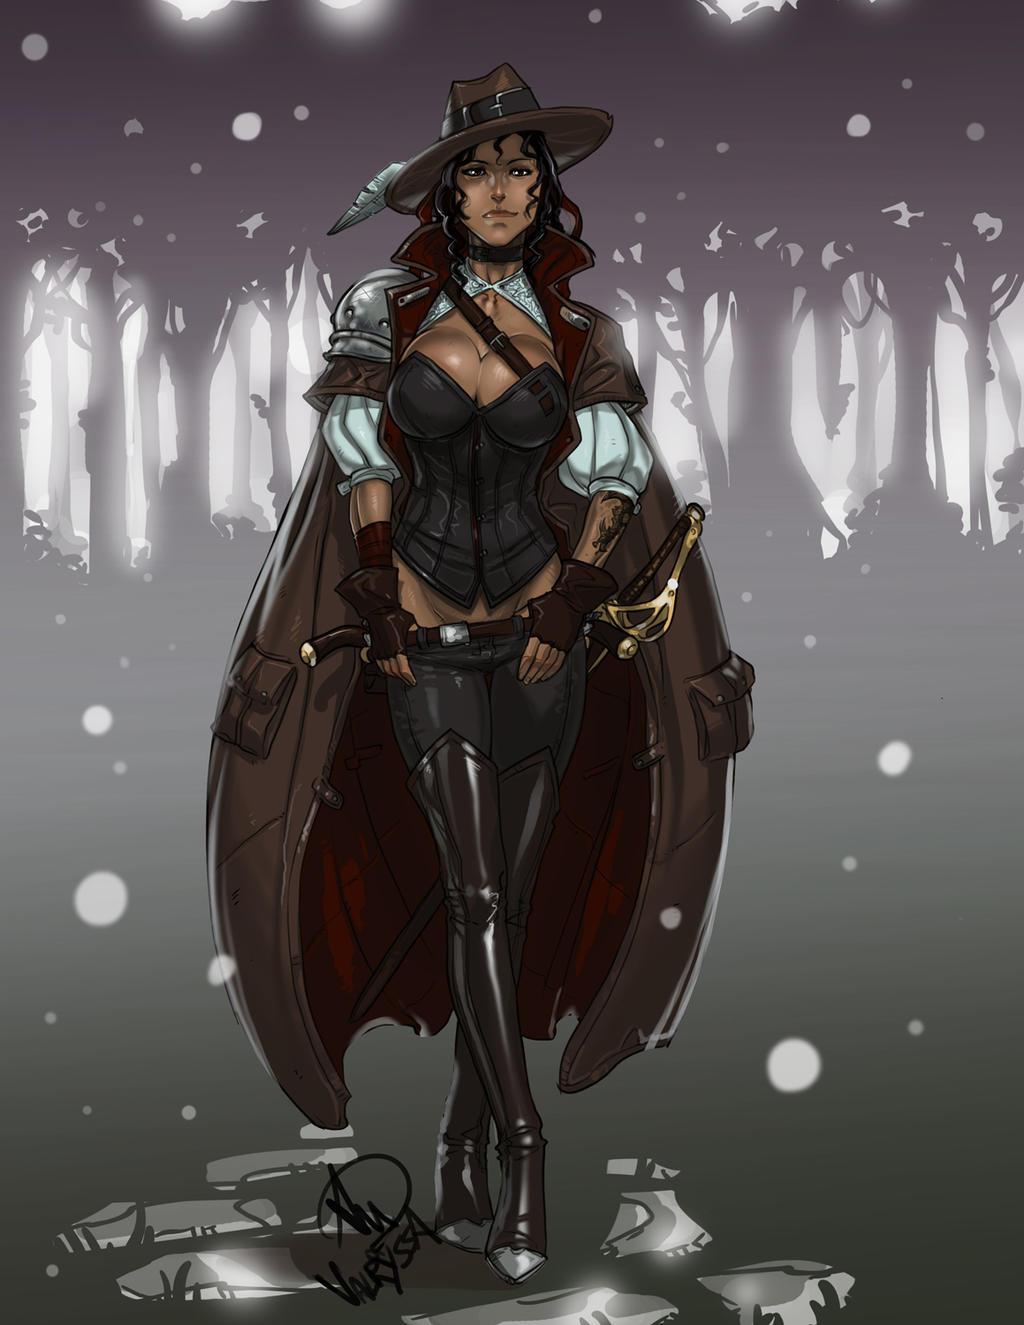 Valryssa the Hallowed by Ganassa